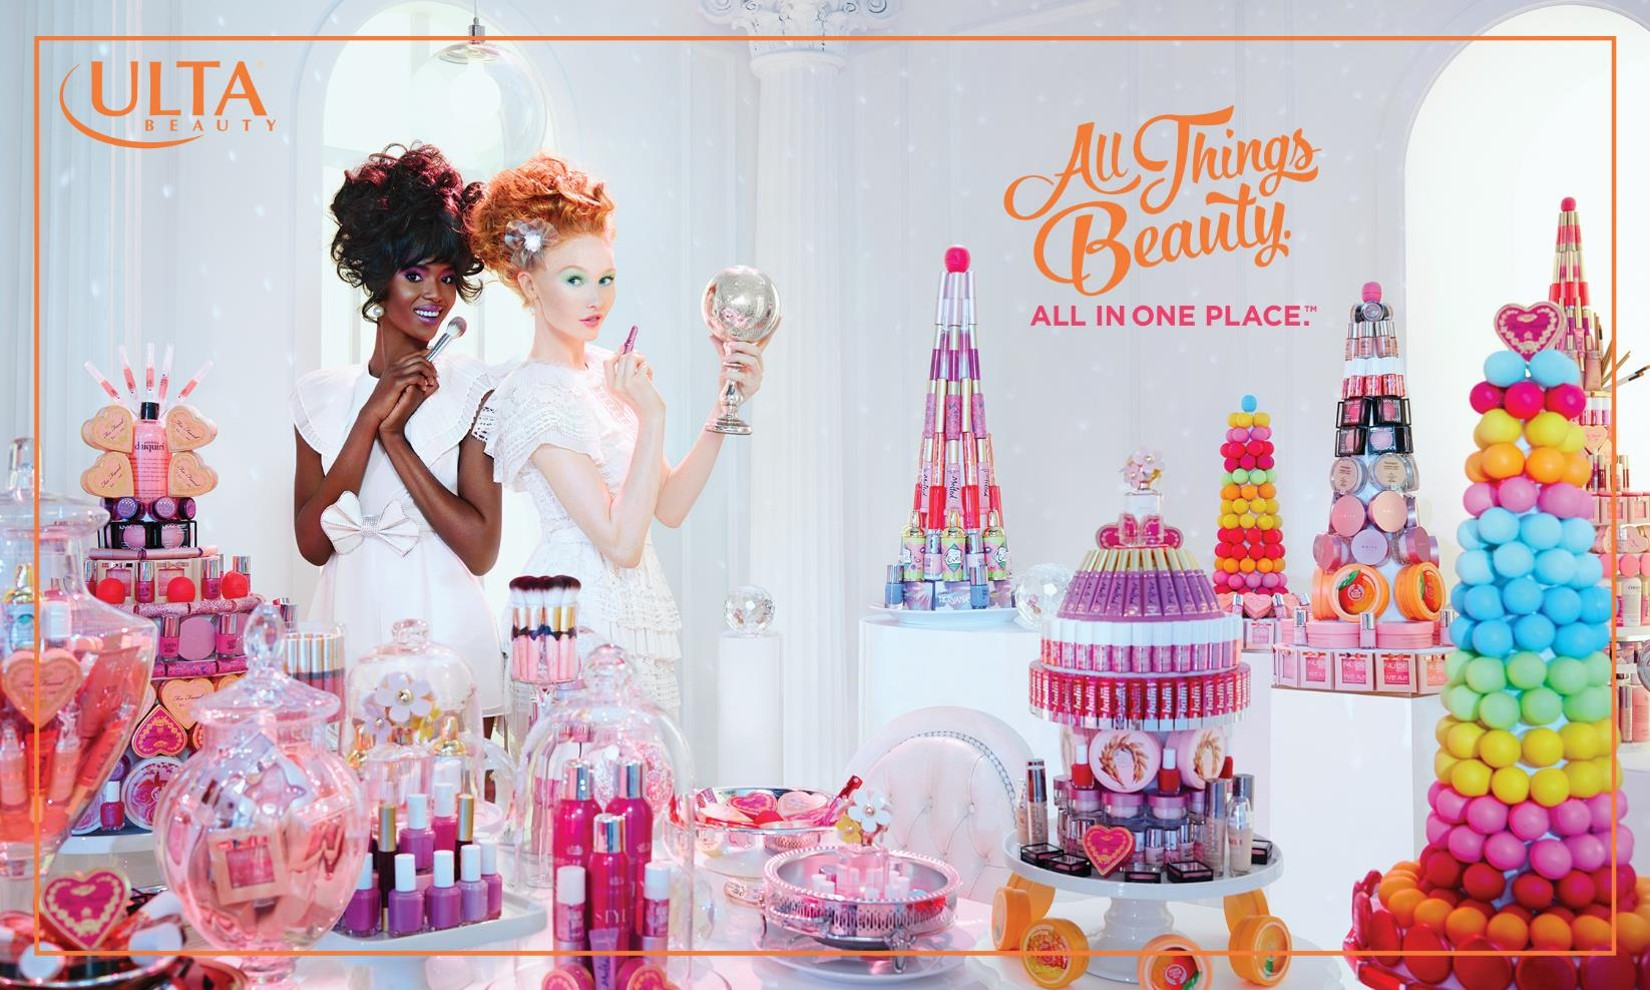 The Ulta Beauty Lose Yourself Contest